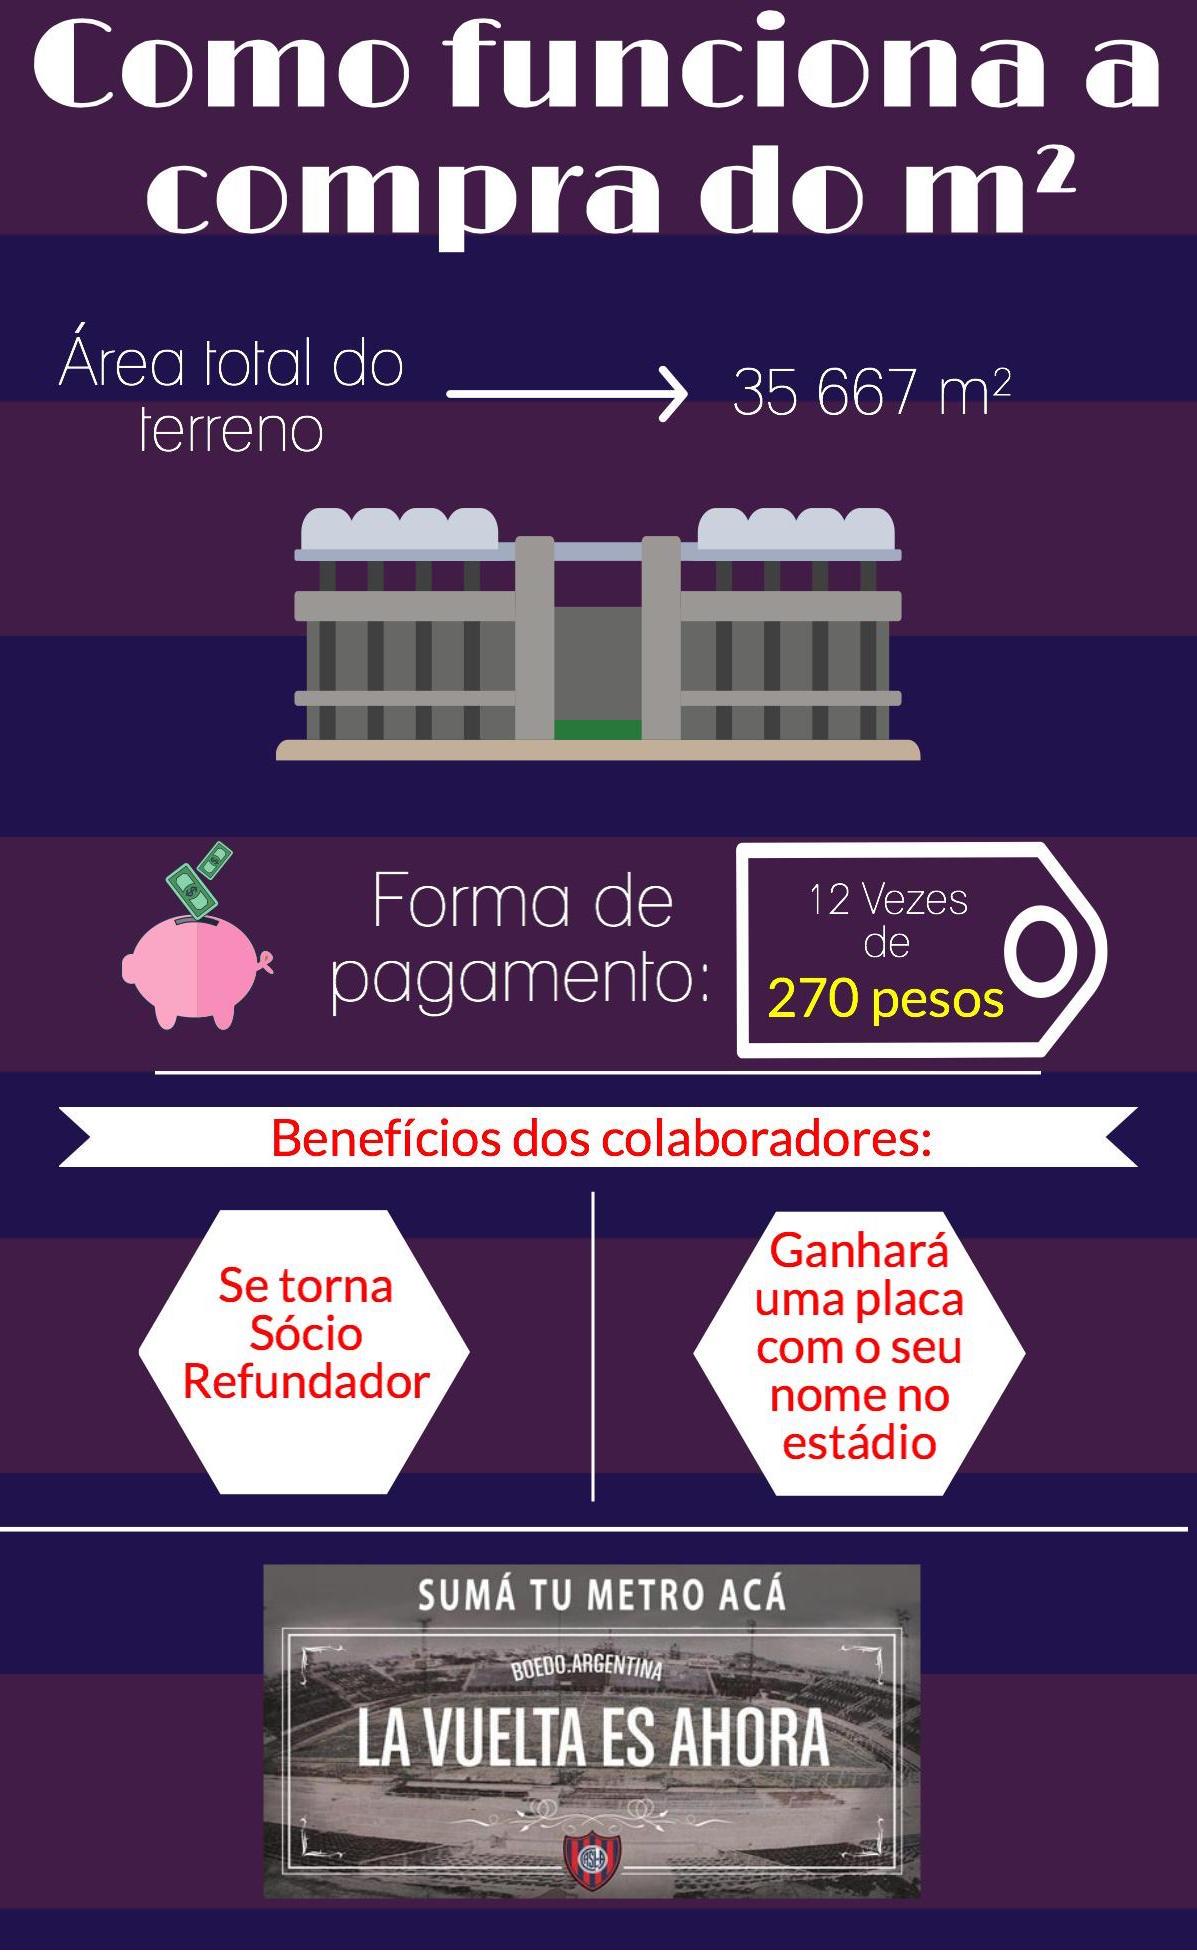 Info Compra 2